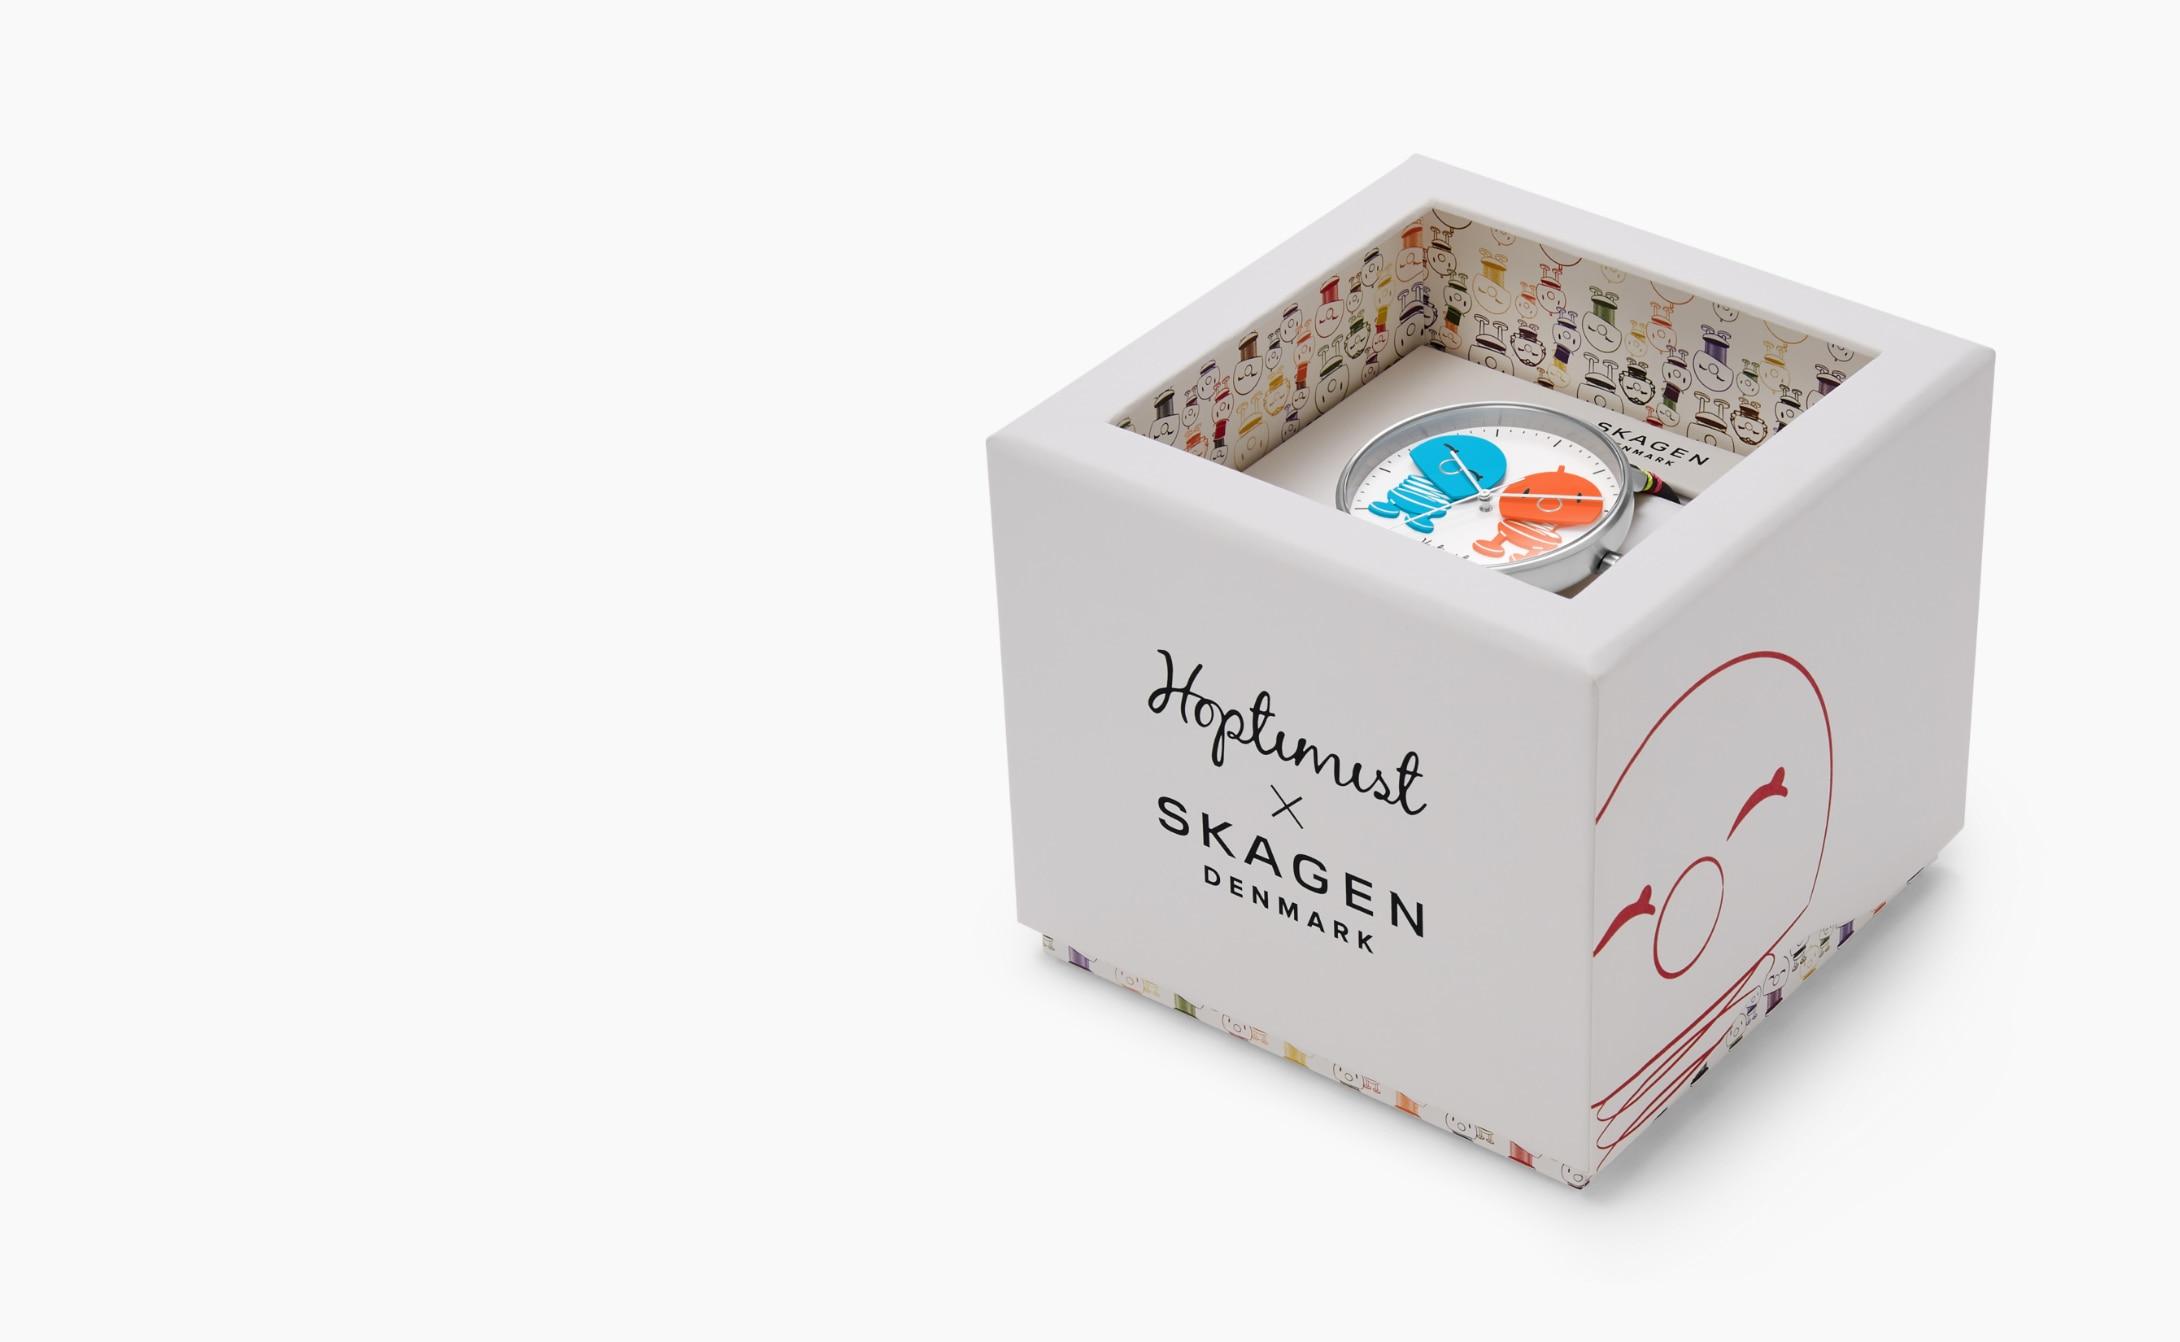 Image of Hoptimist packaging.